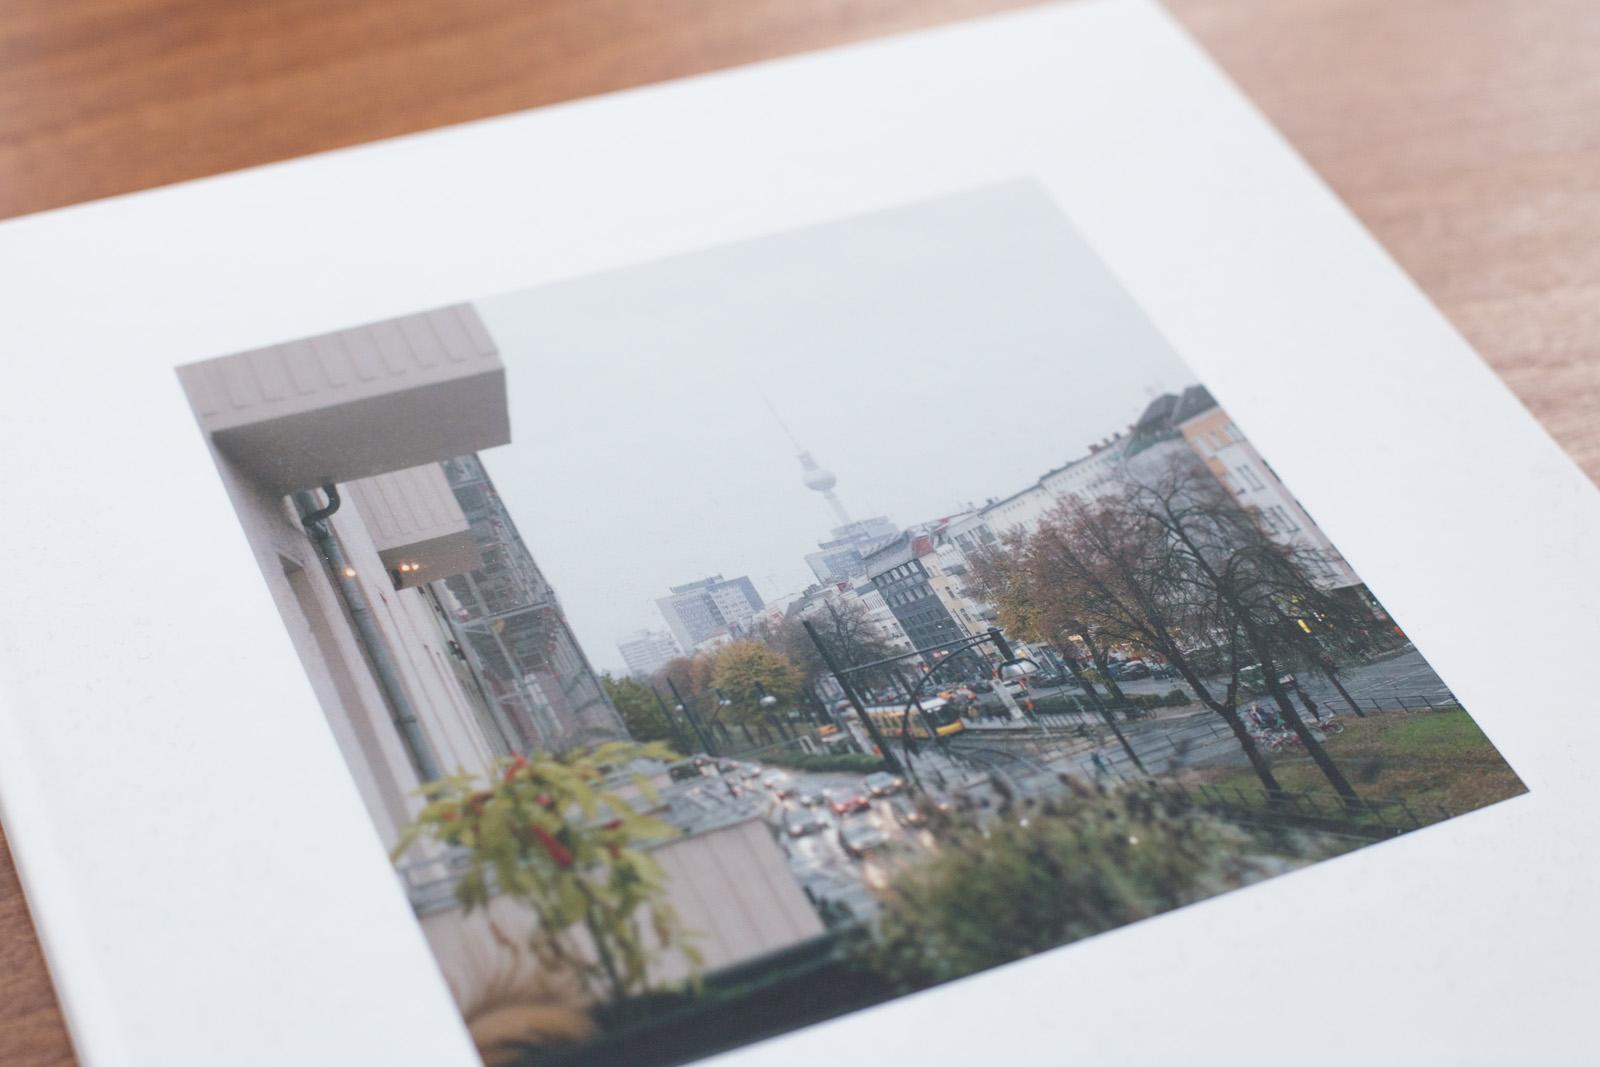 1_Saal digital Fotoalbum__MG_0803